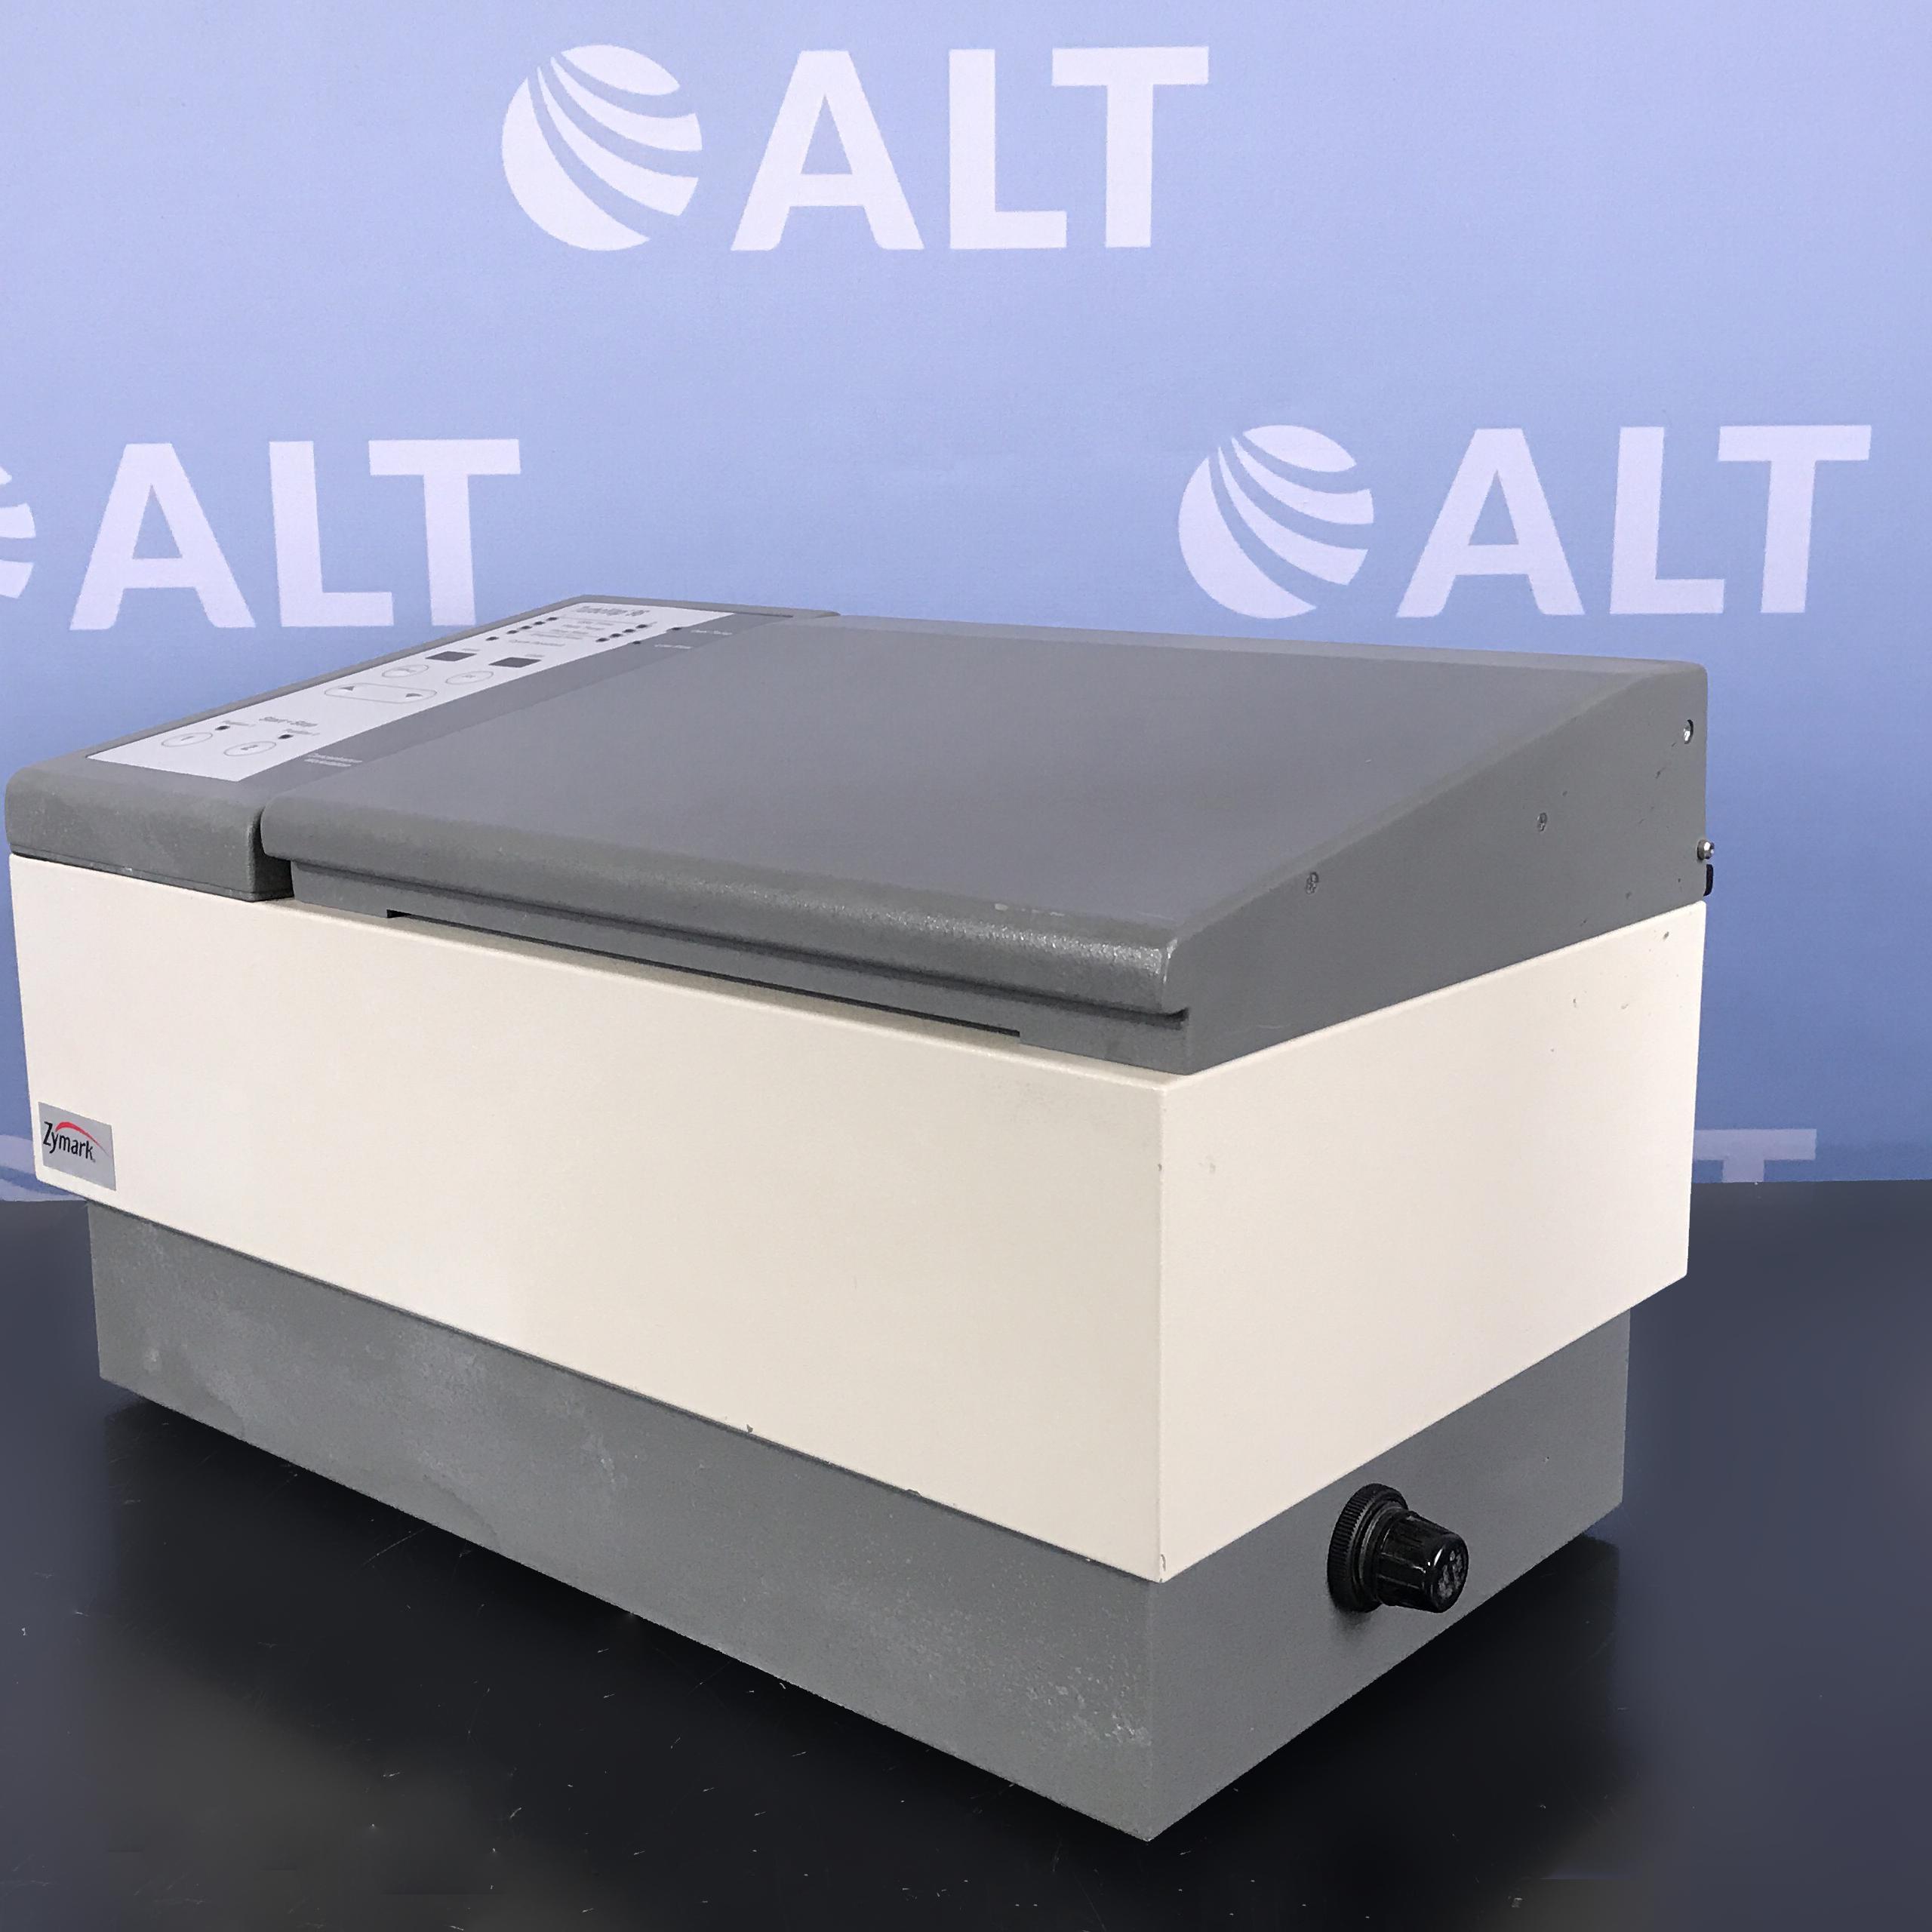 Zymark TurboVap 96 Concentration Evaporator Workstation Image